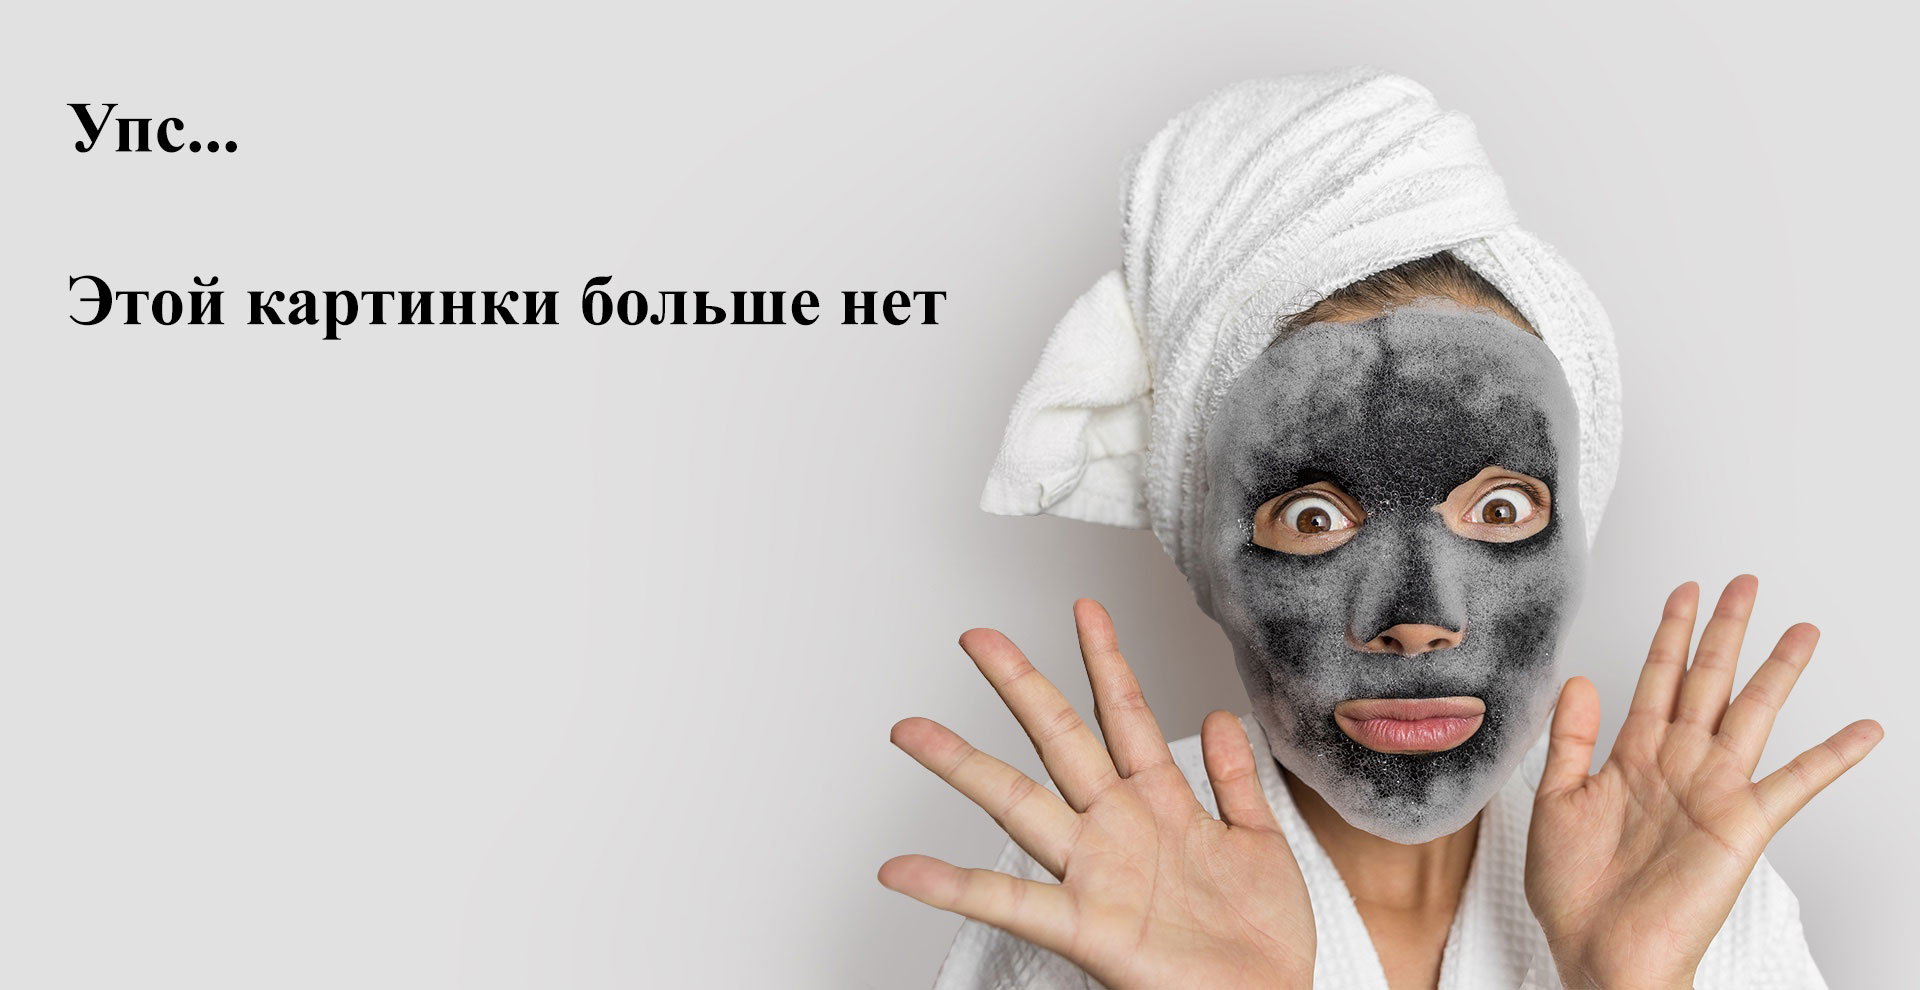 Siberina, Пена для ванны «Кедр», 250 мл